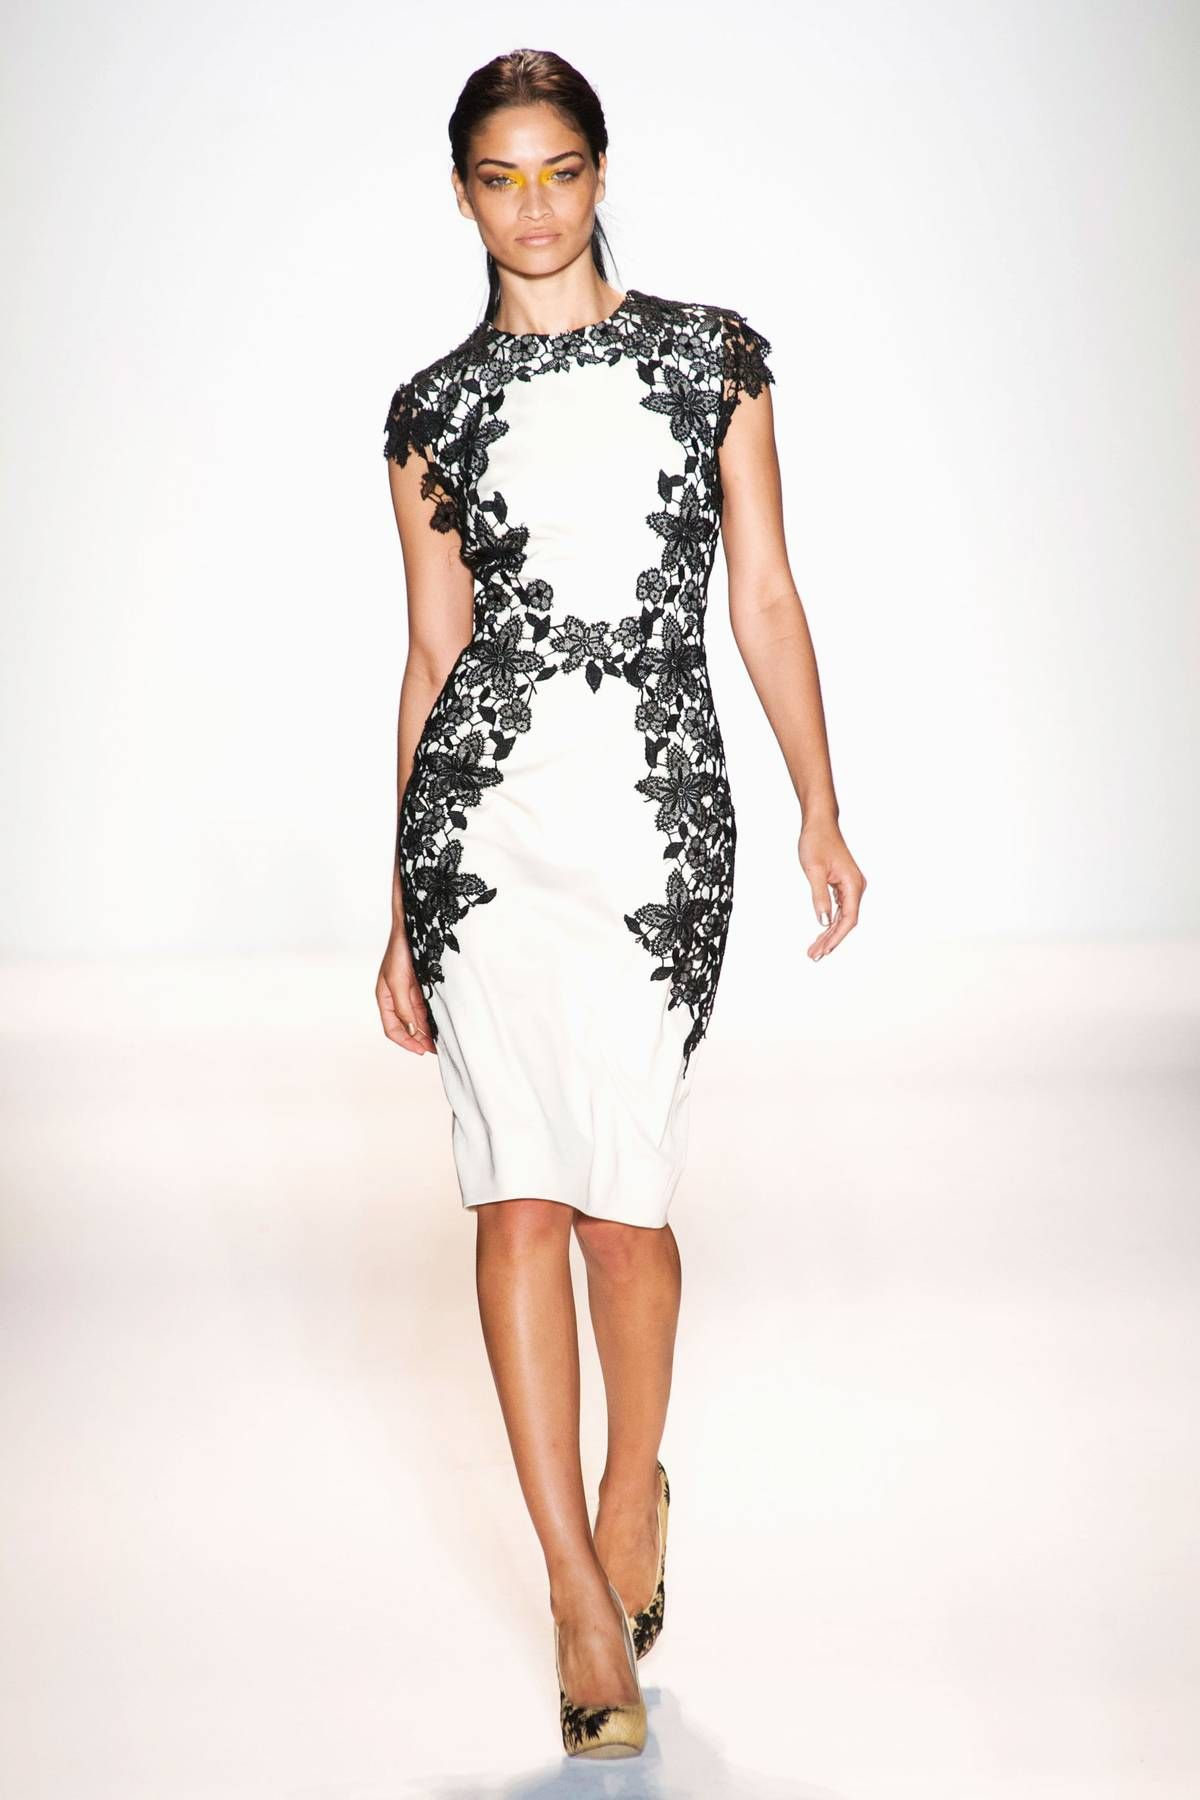 Lela Rose Spring 2013 RTW Collection - Fashion on TheCut